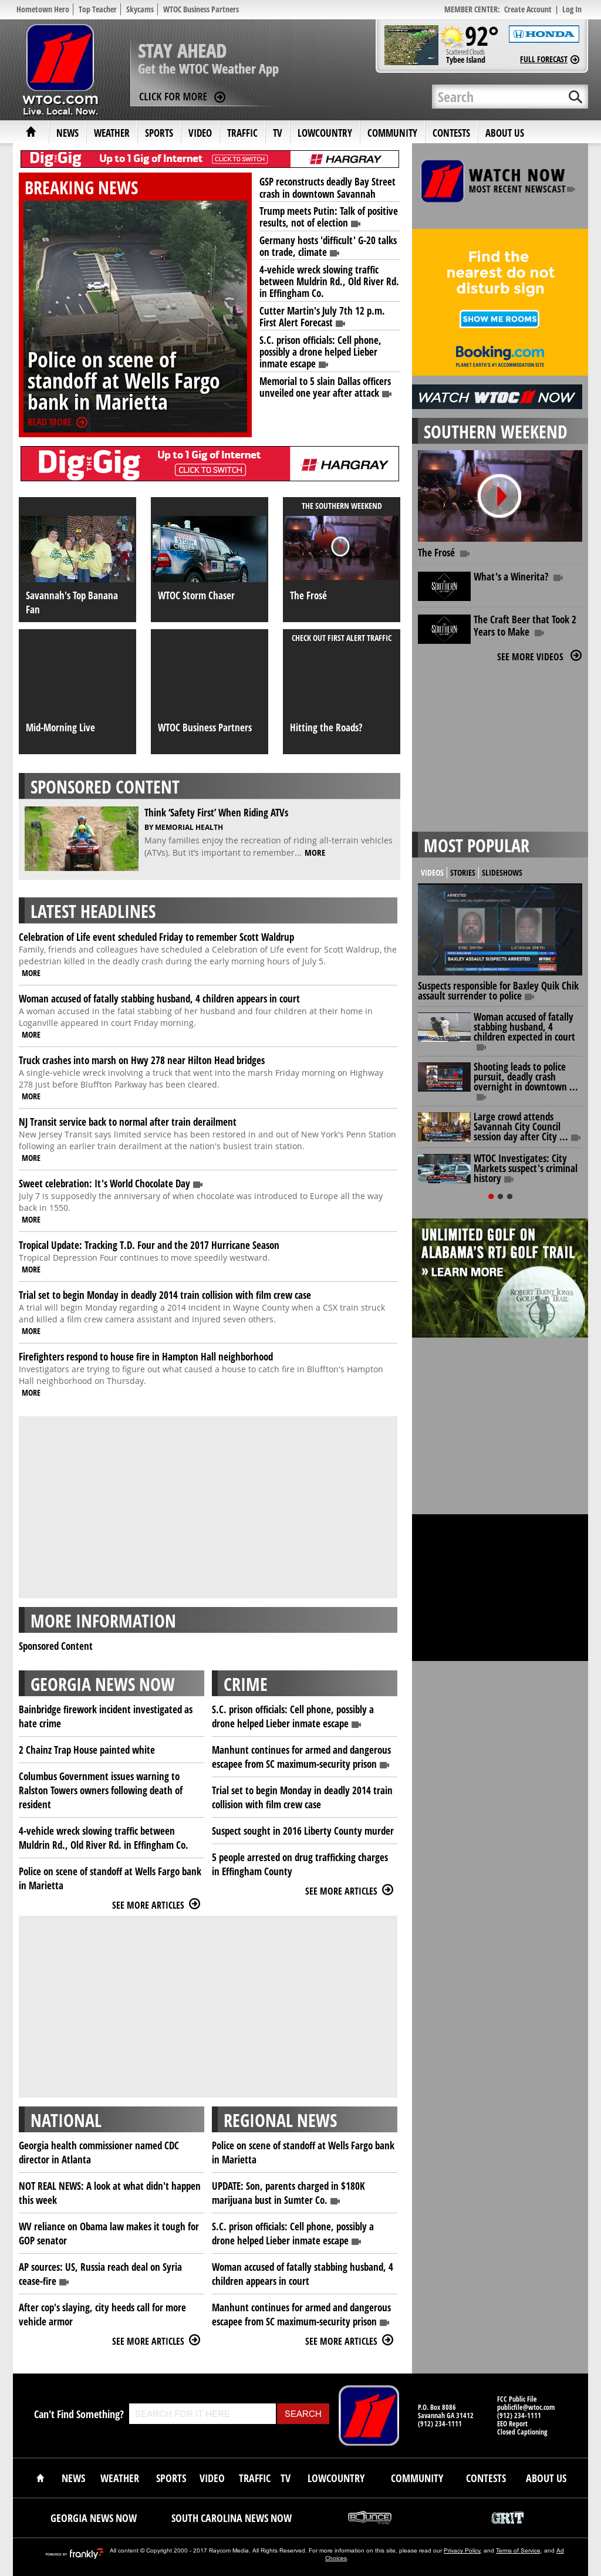 Owler Reports - WTOC: WTOC Meteorologist Pat Prokop Retiring